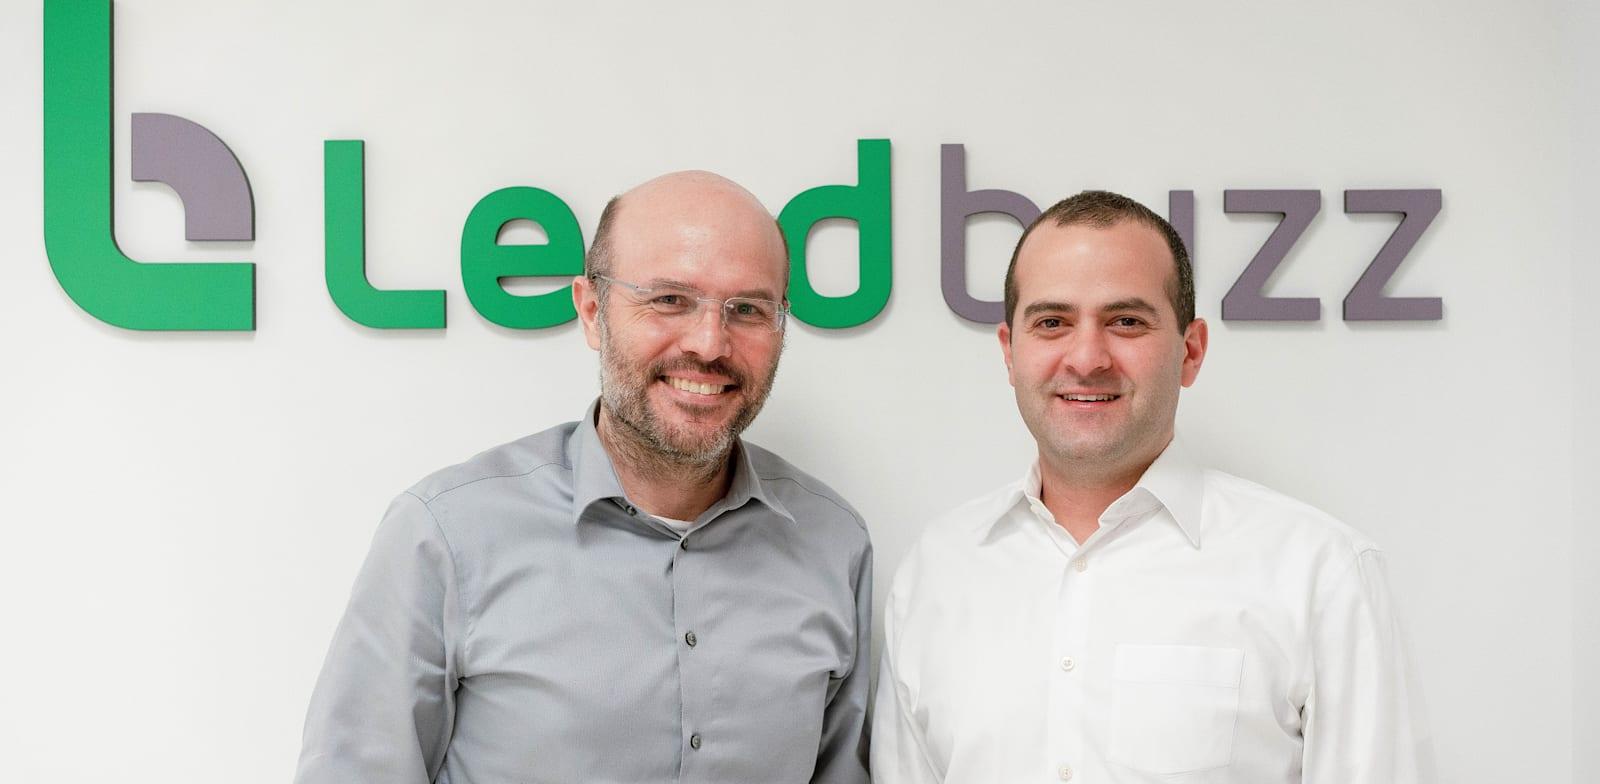 Lendbuzz founders Photo: PR